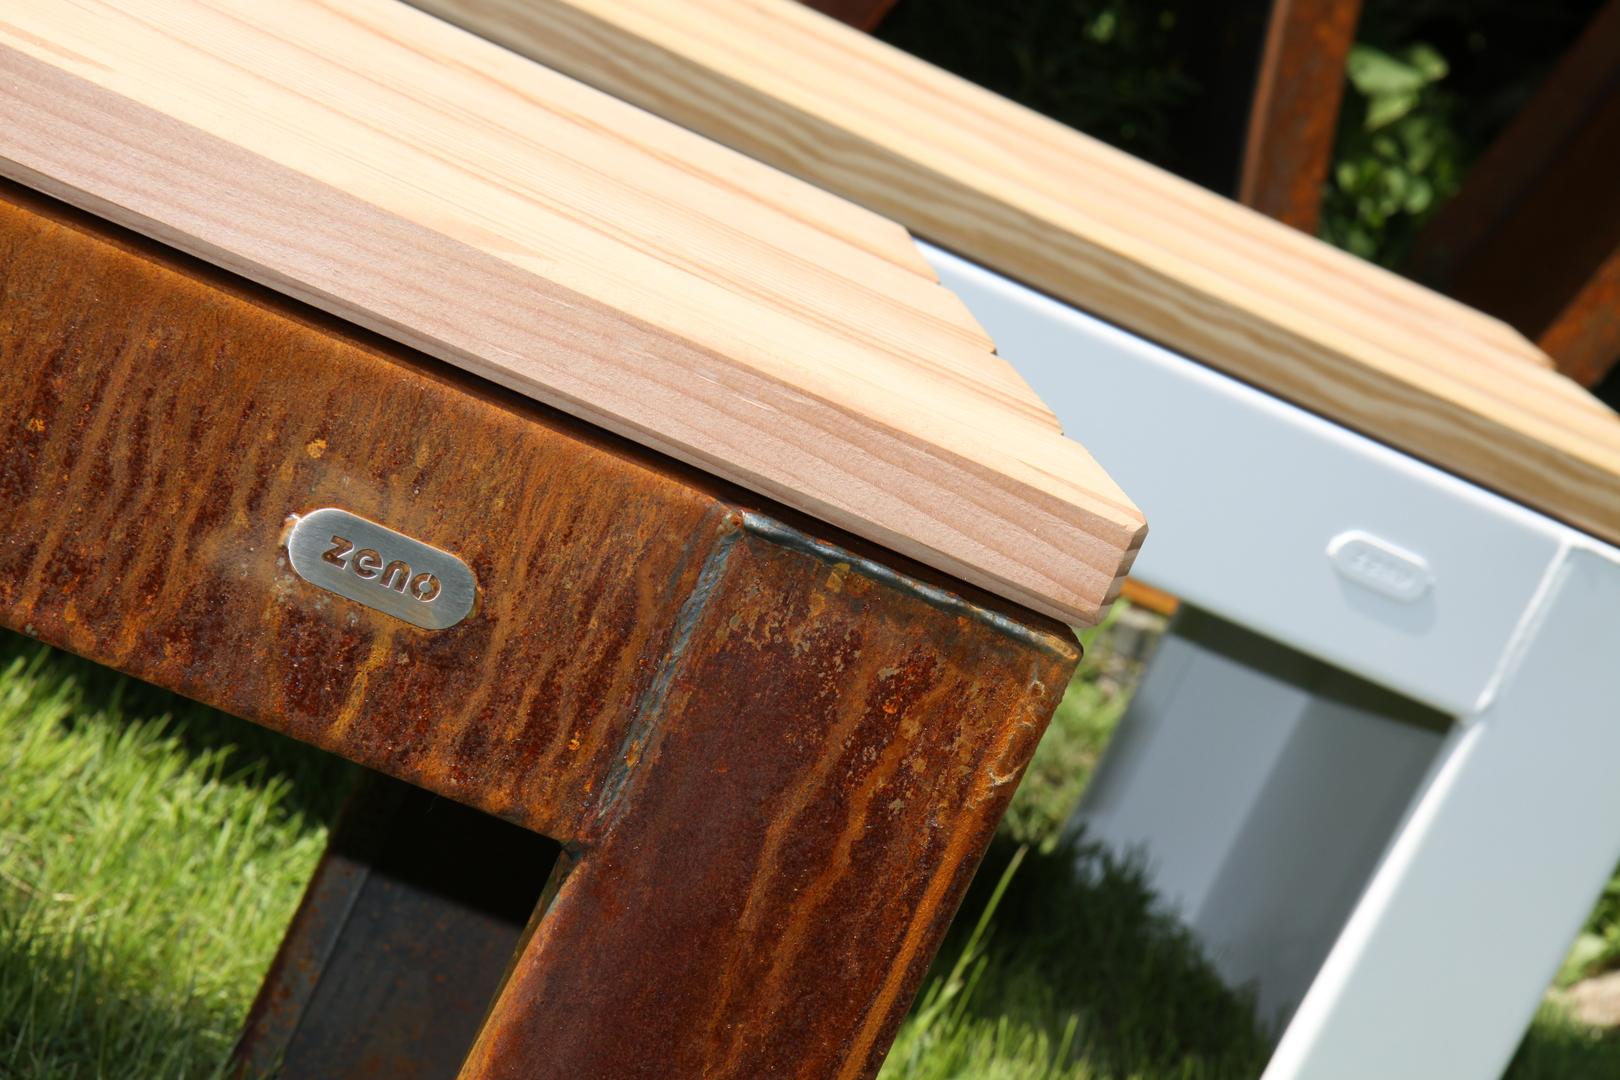 Zeno Garden Bench (1).JPG